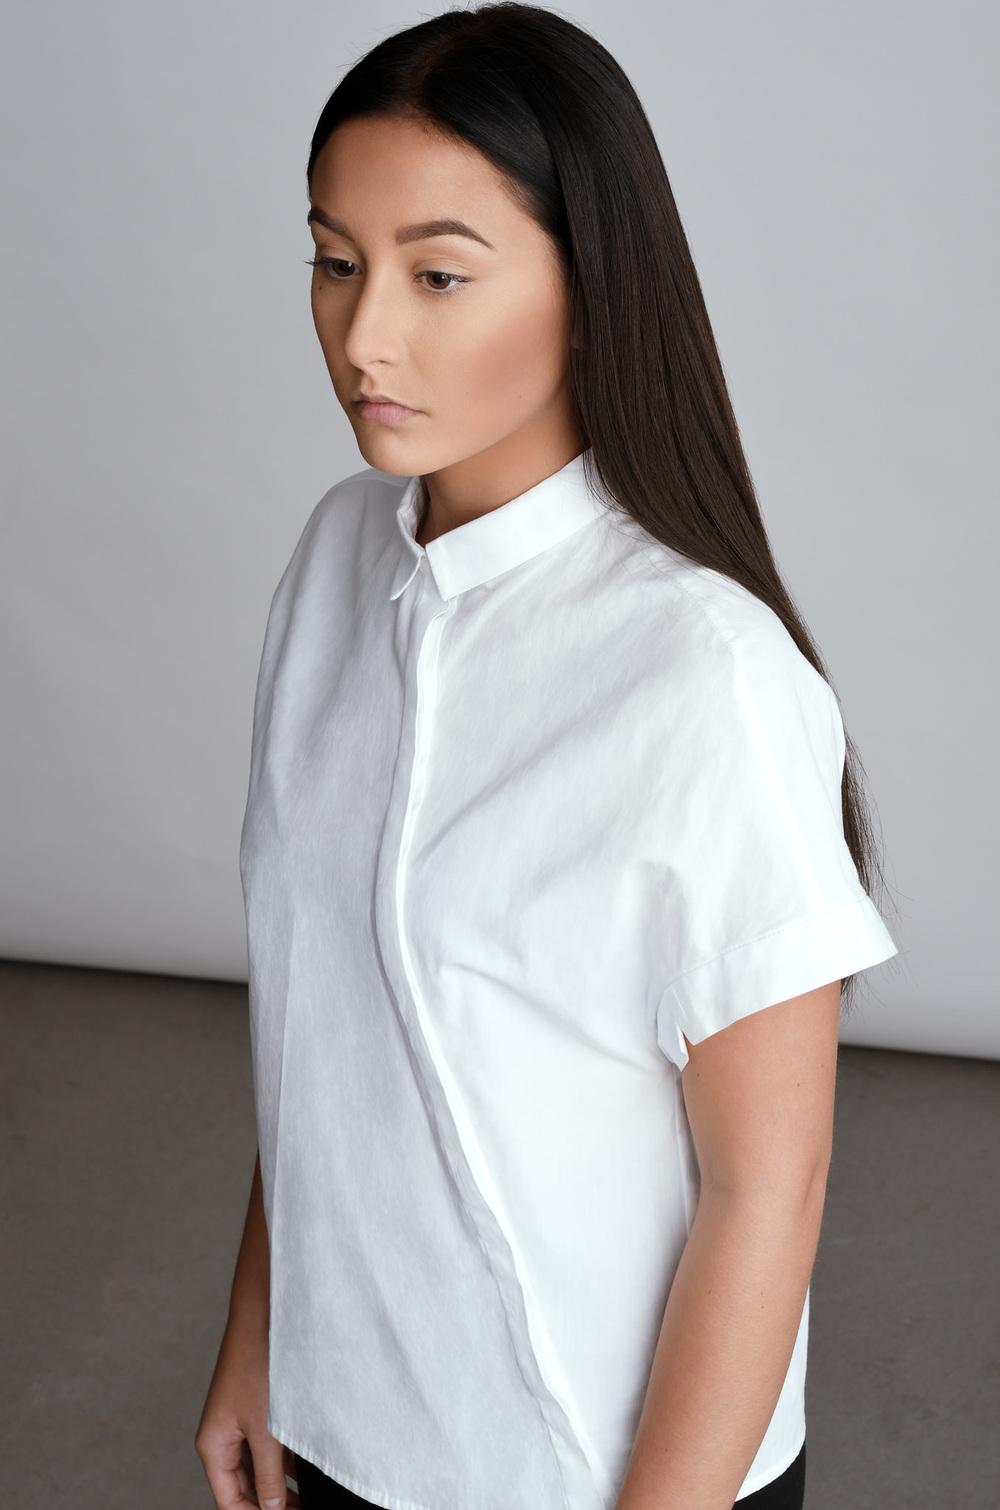 Imarlee Asian White Shirt Decrease1 Crisp Curve.jpg